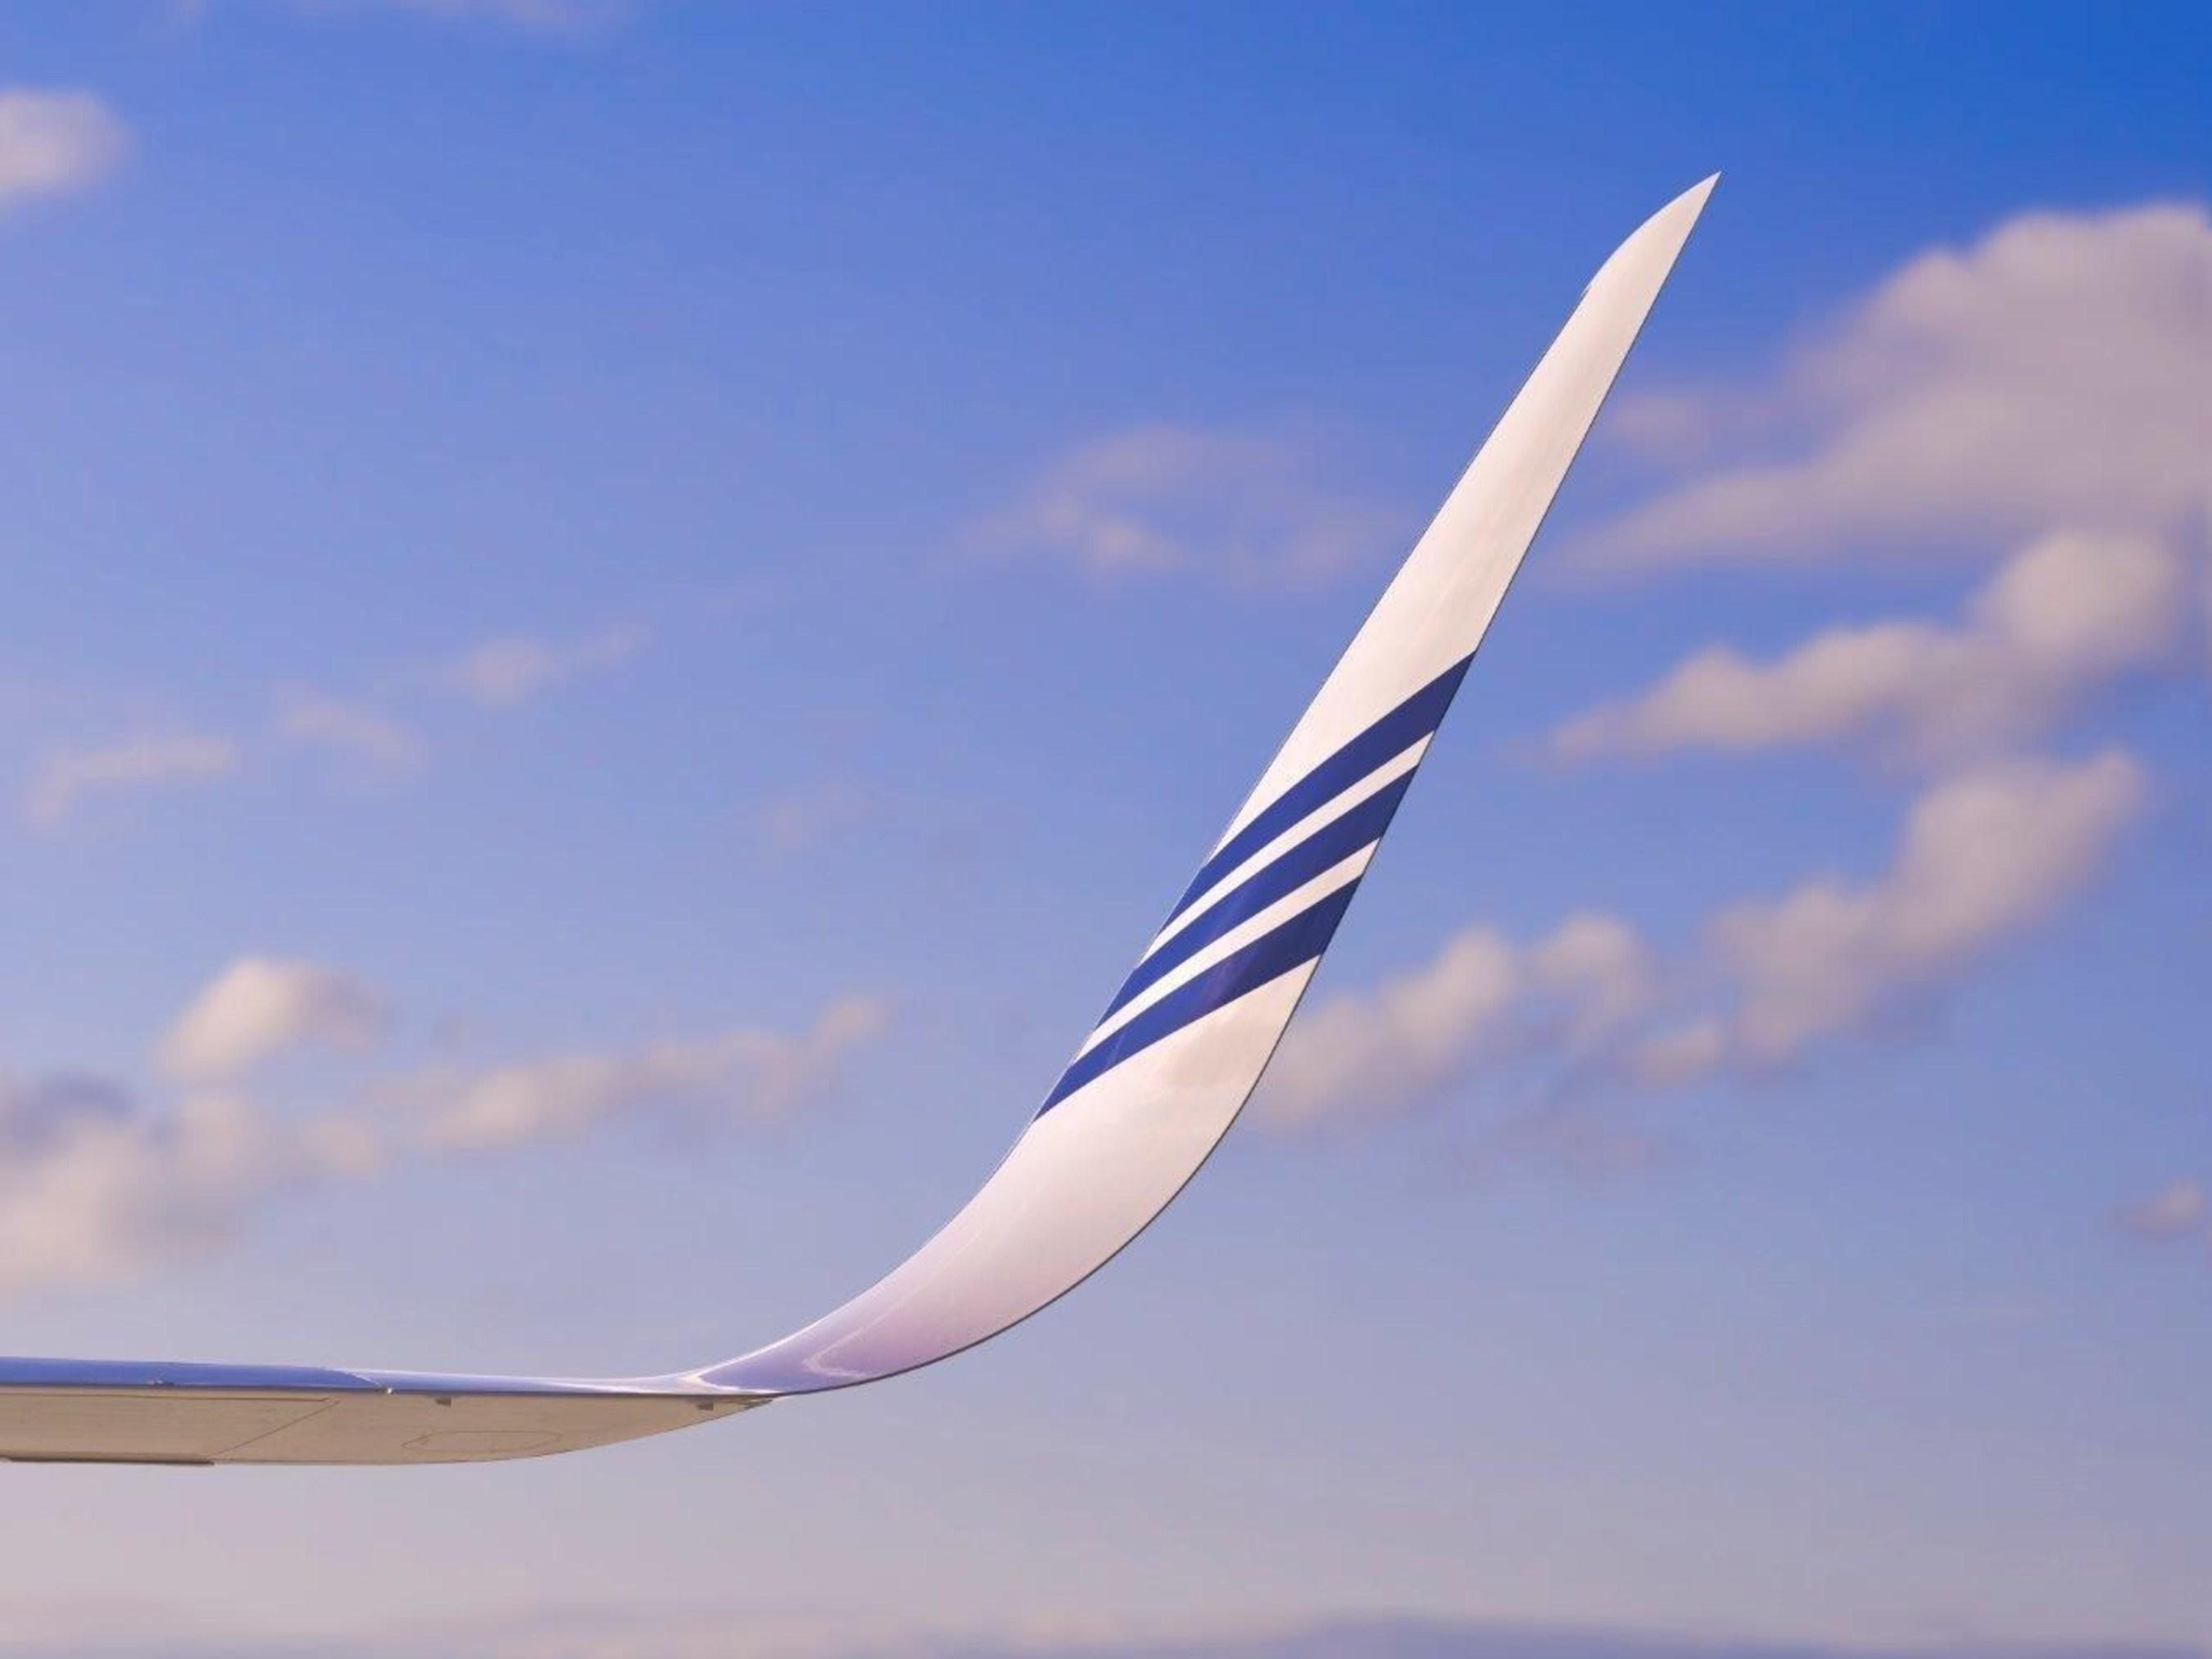 5 Billion Gallons of Jet Fuel Saved